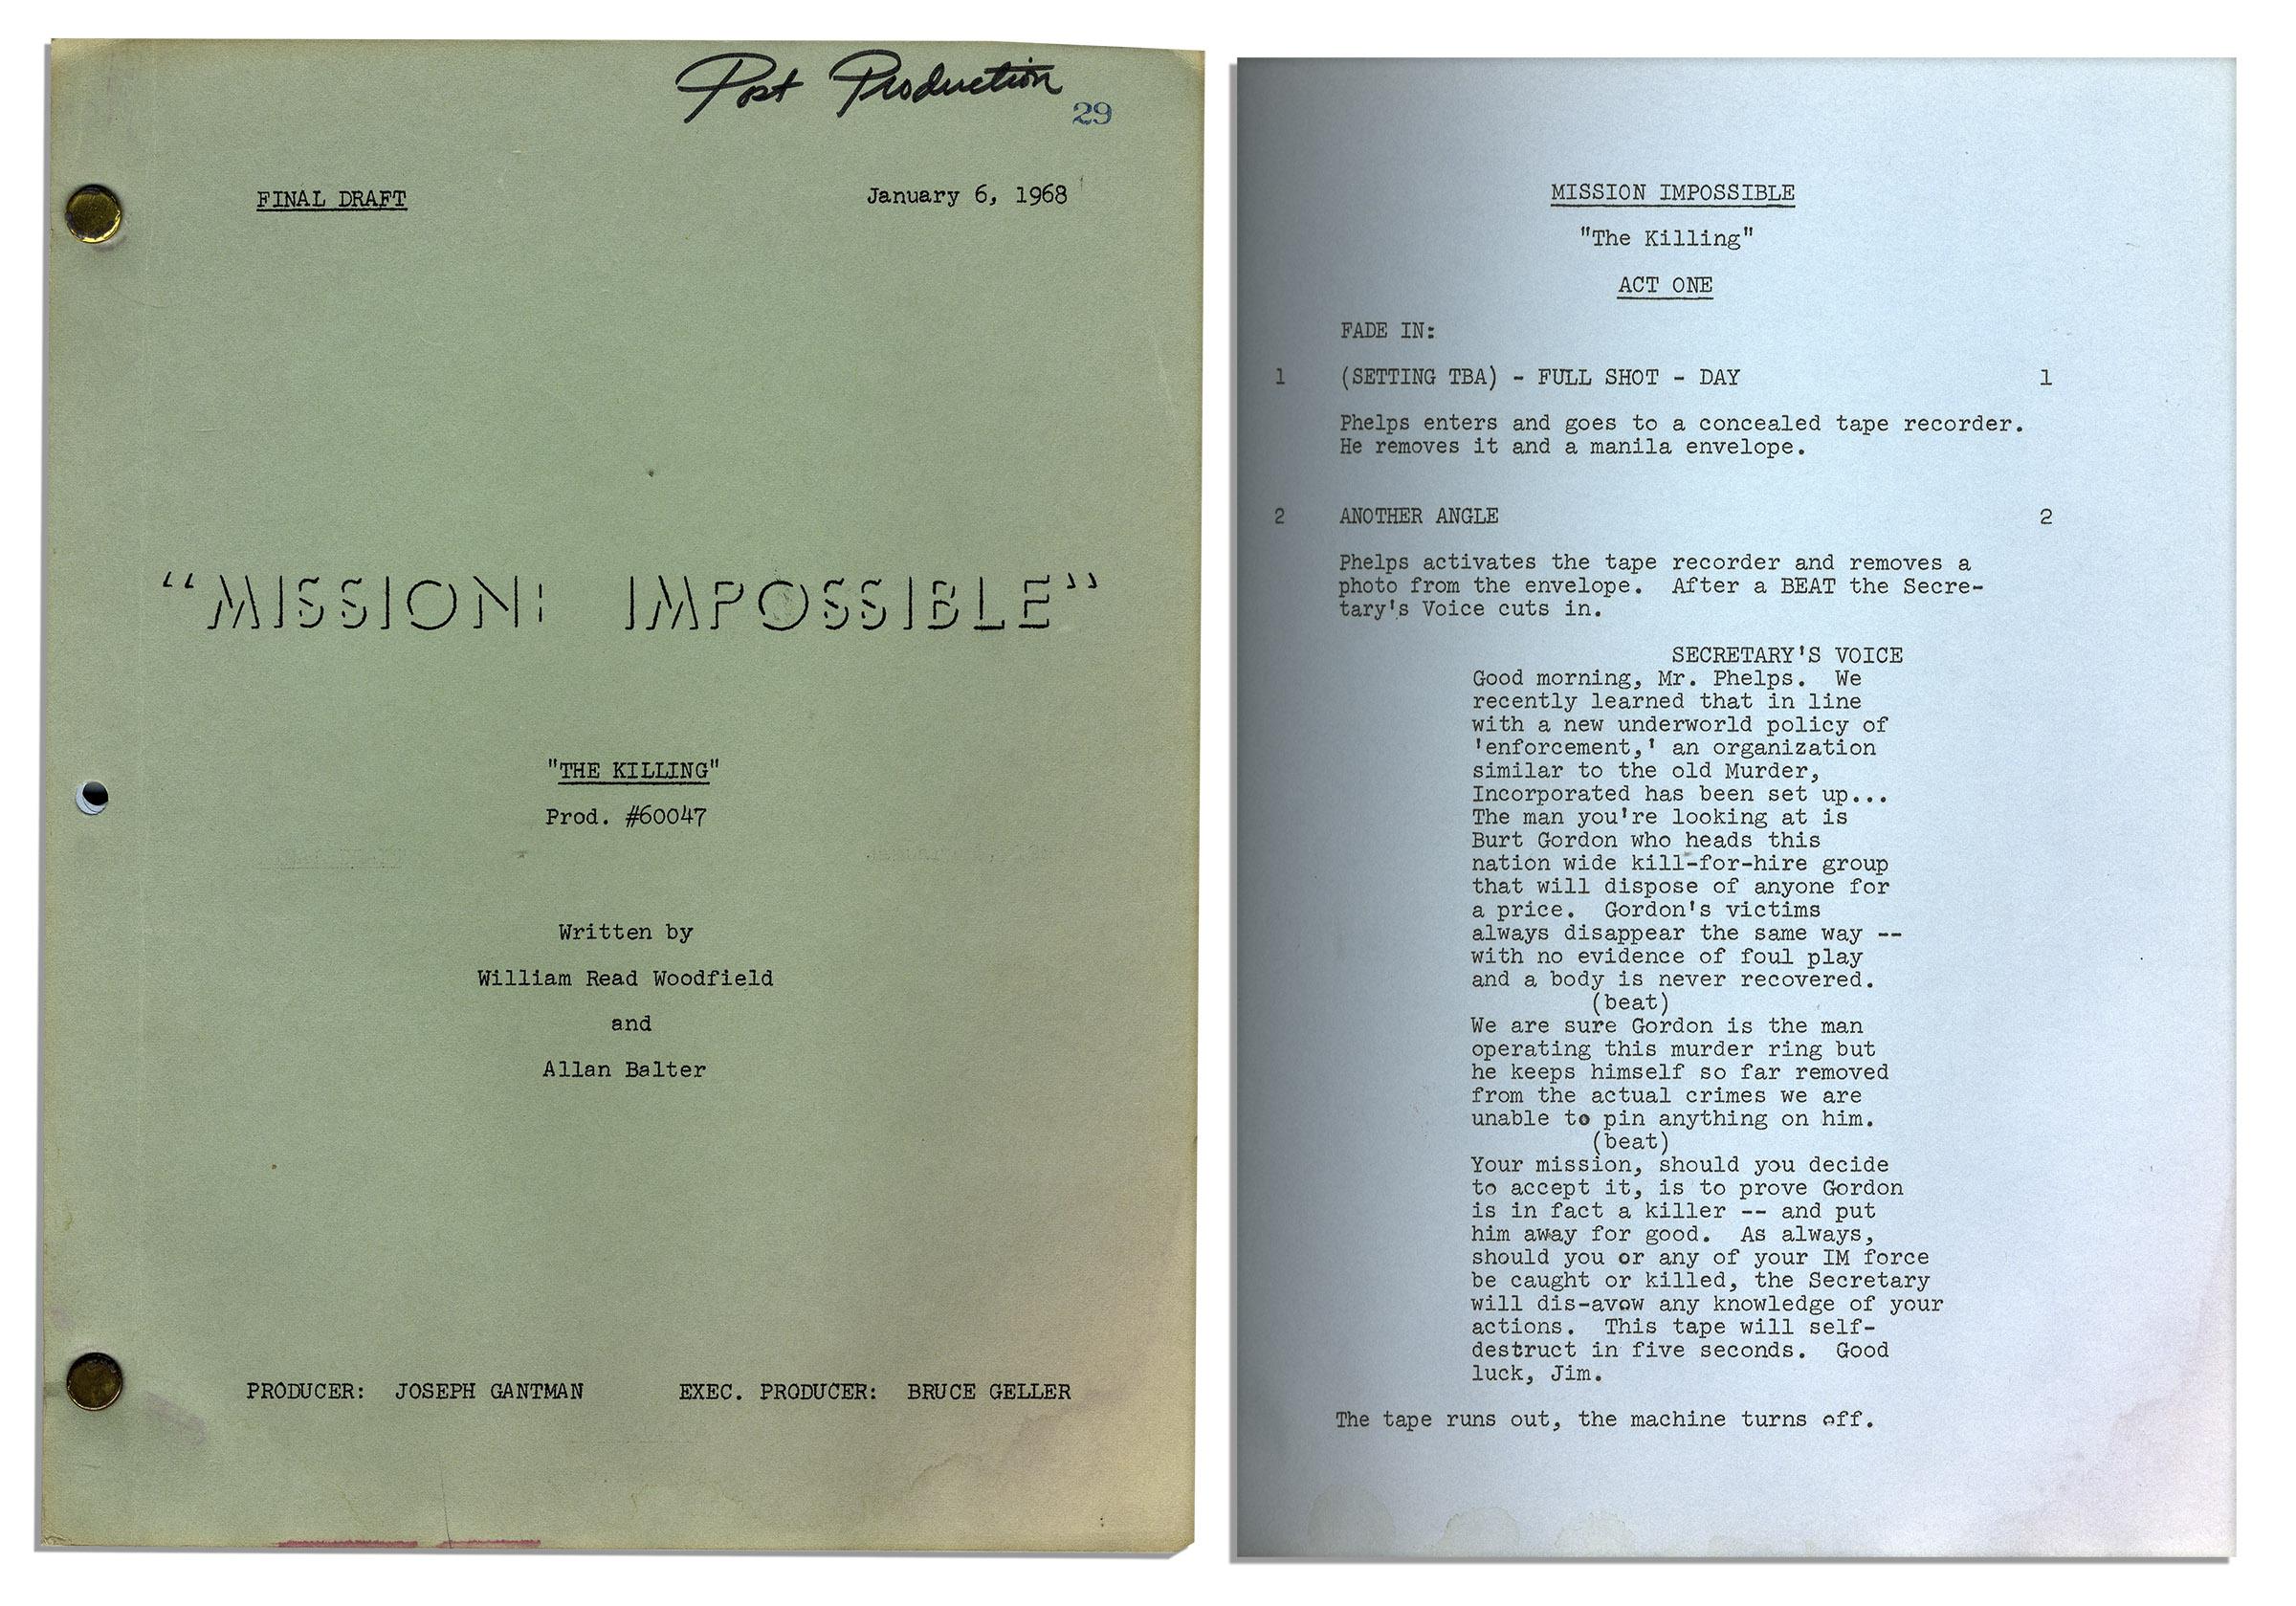 mission impossible script at imsdb autocars blog